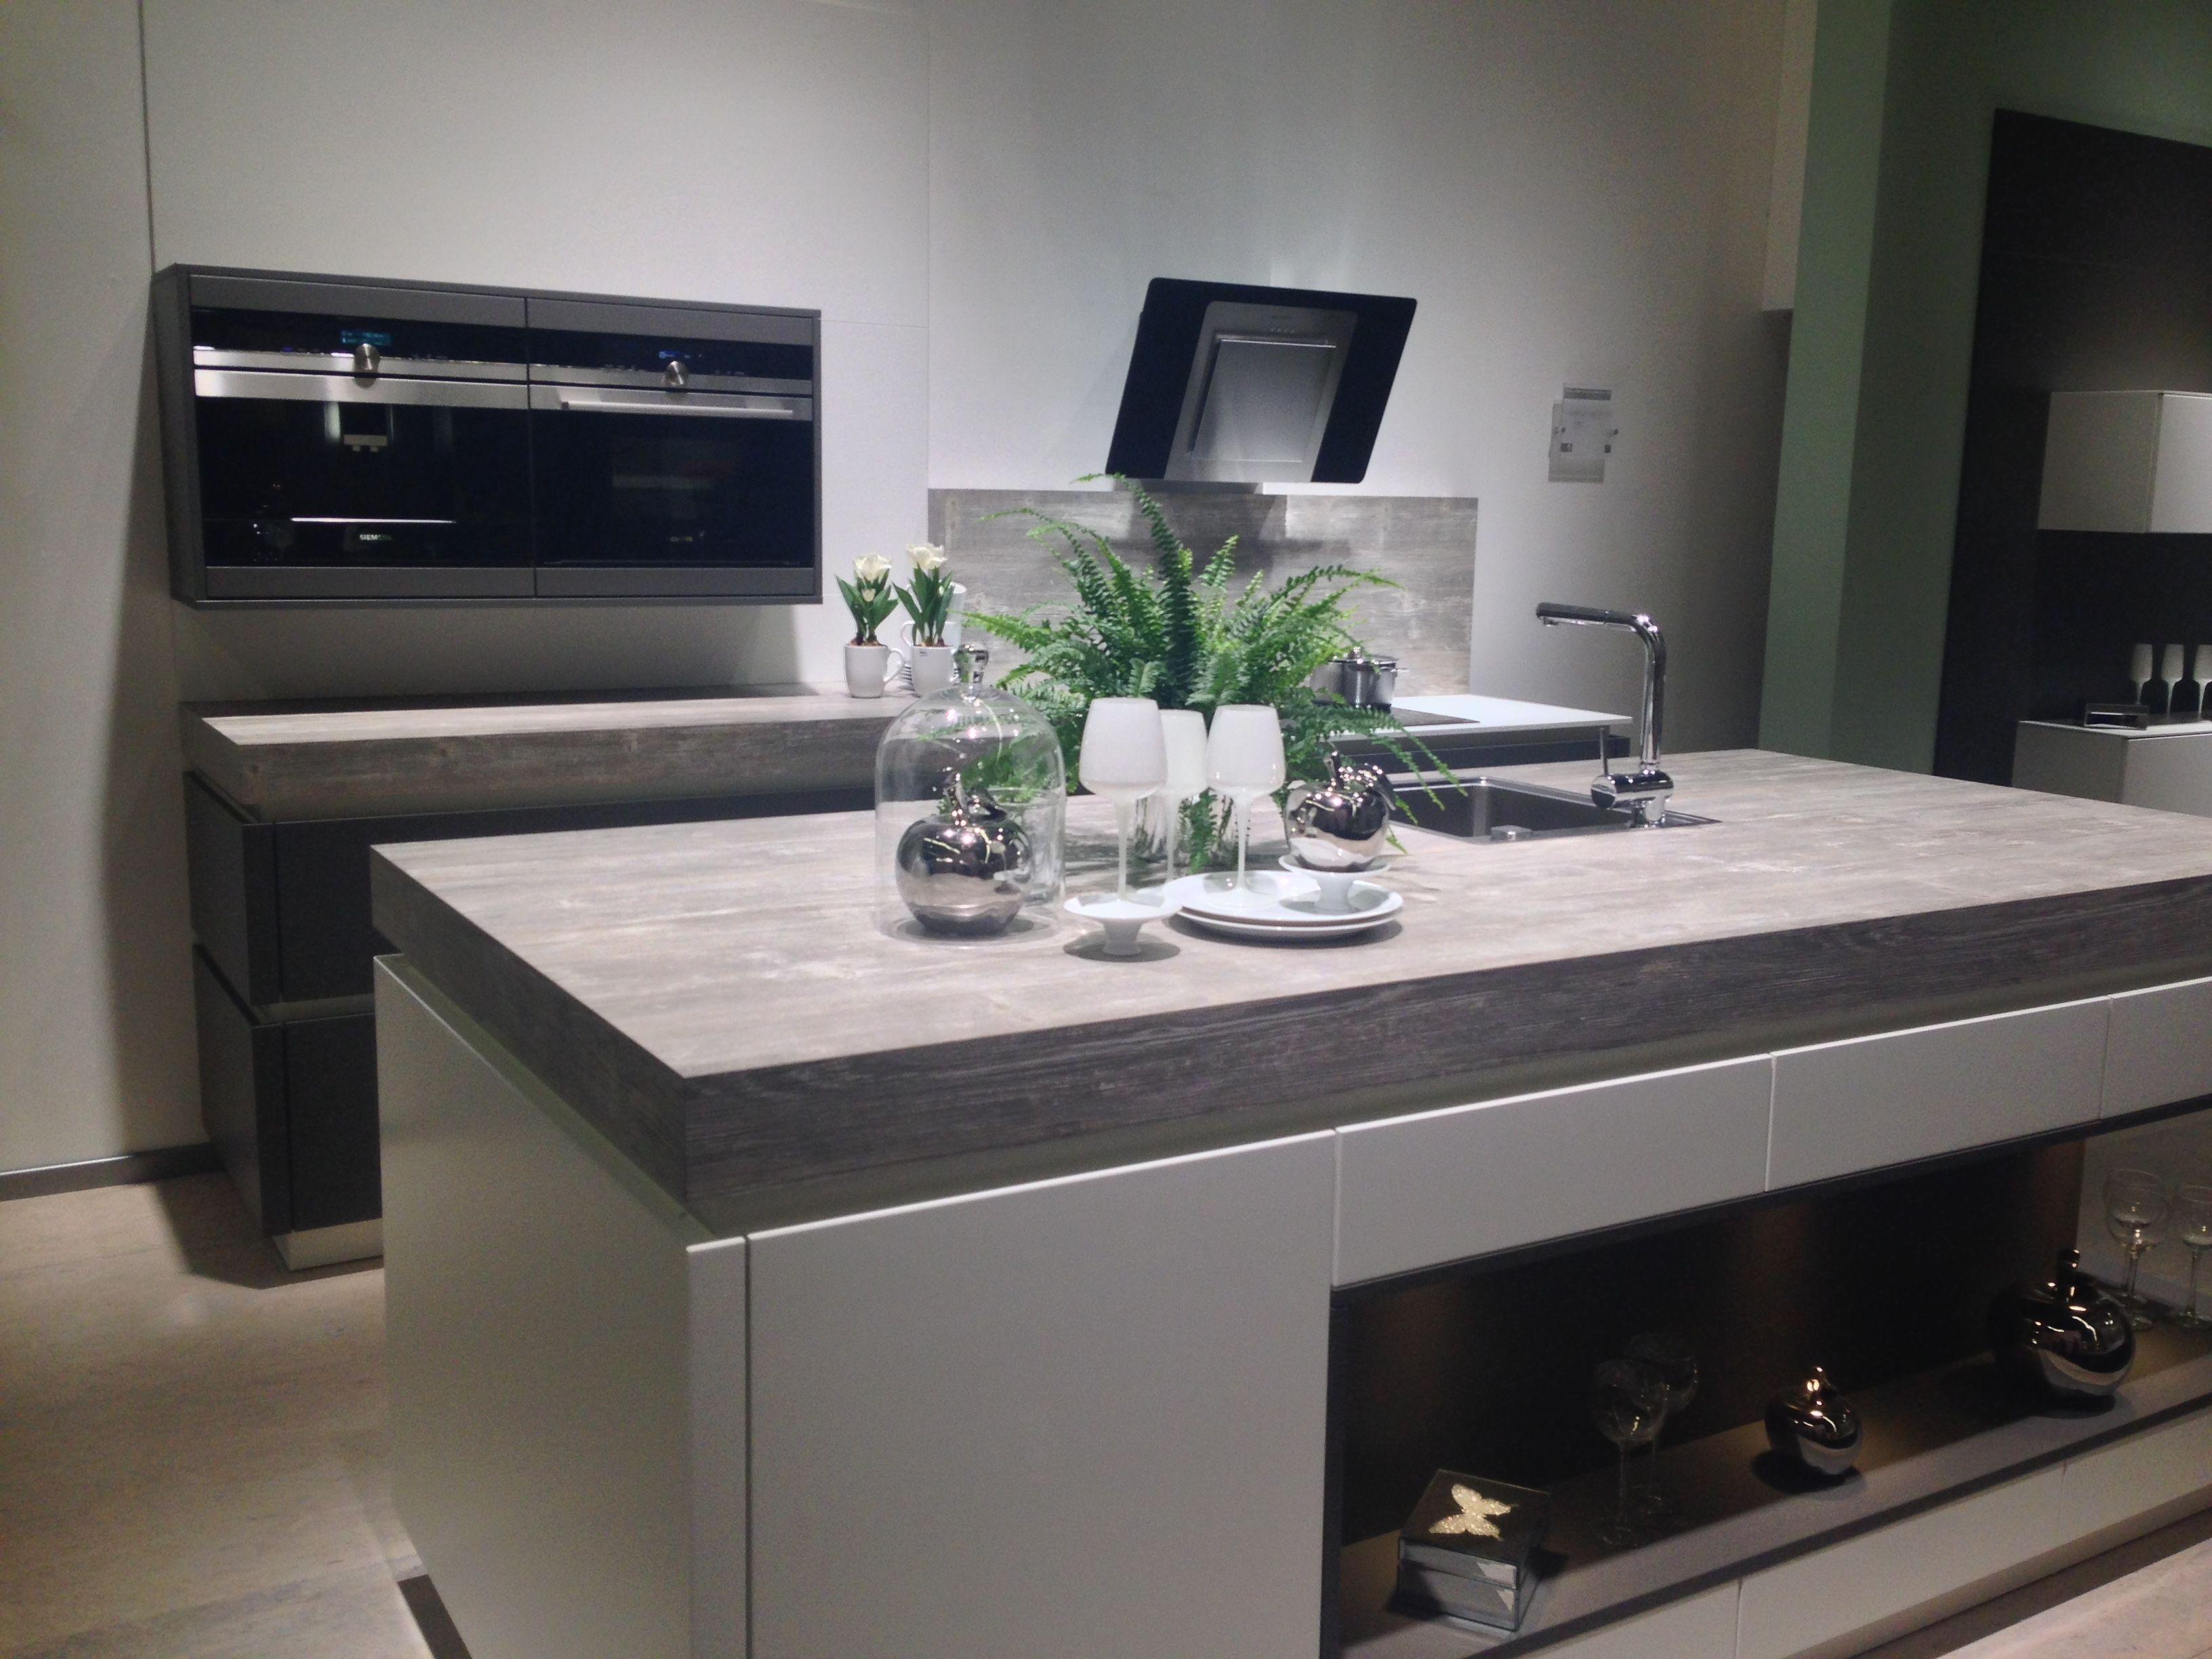 Bauformat Küche bauformat küchen bauformat küche